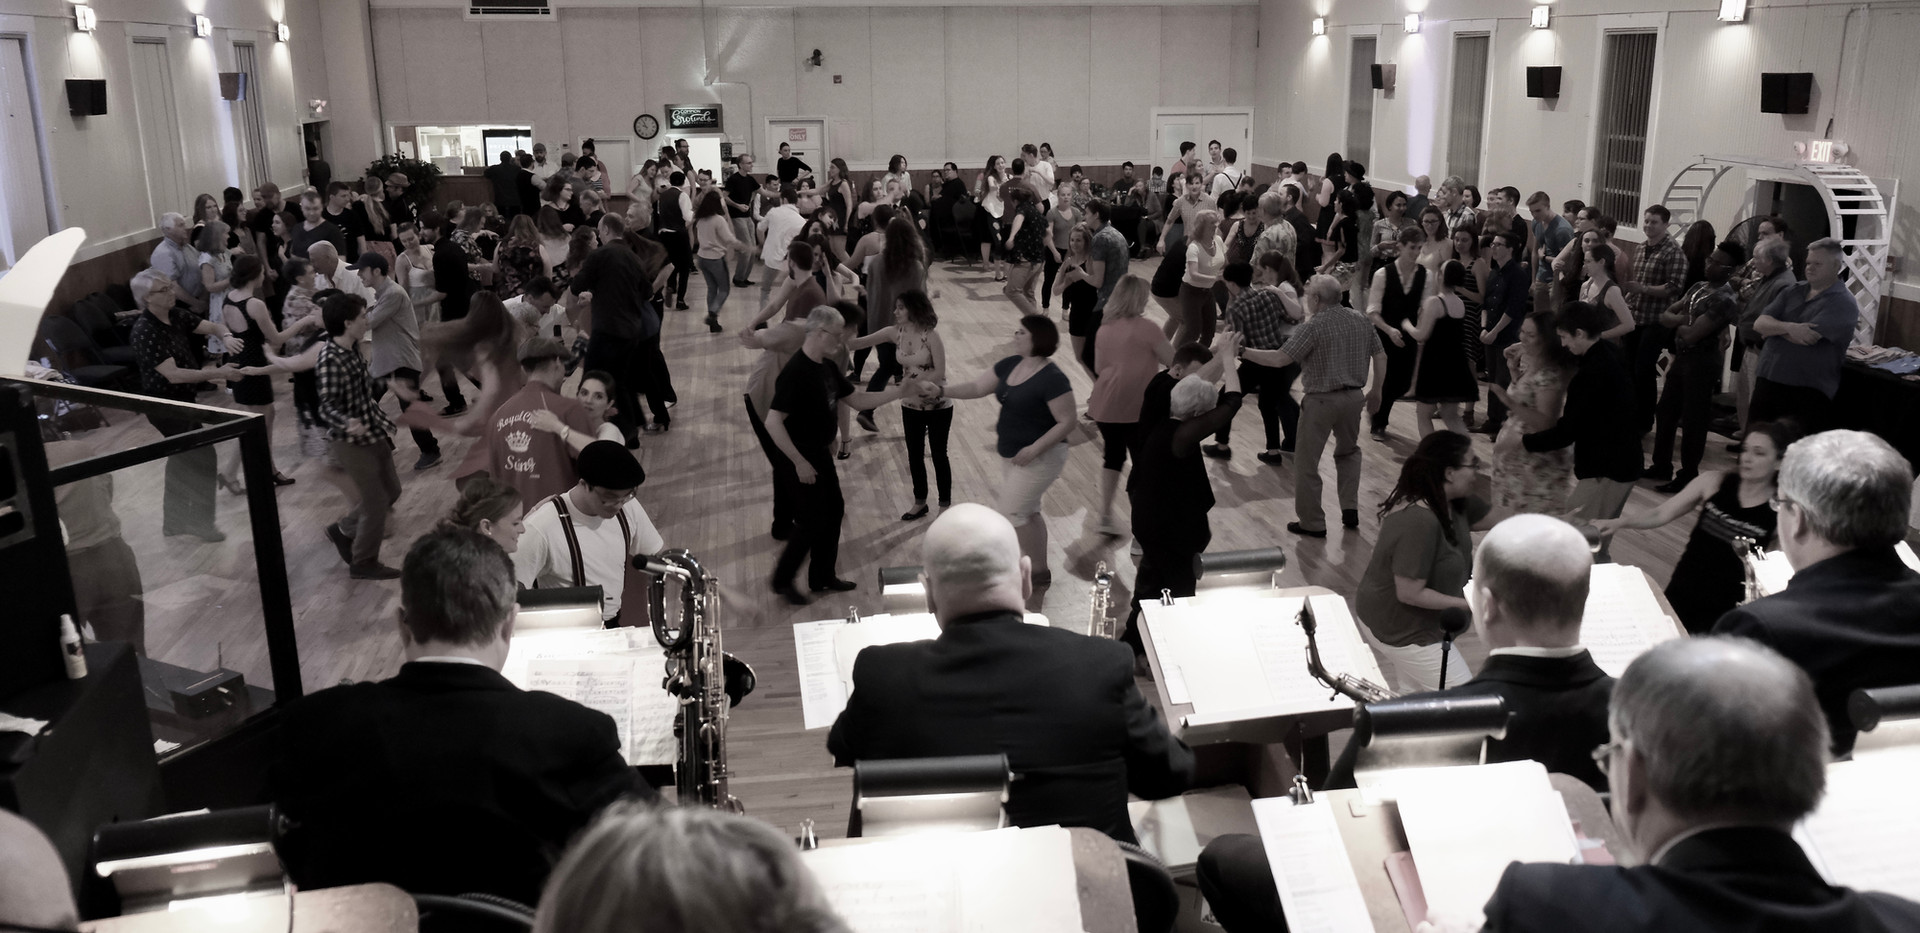 Grand opening dance